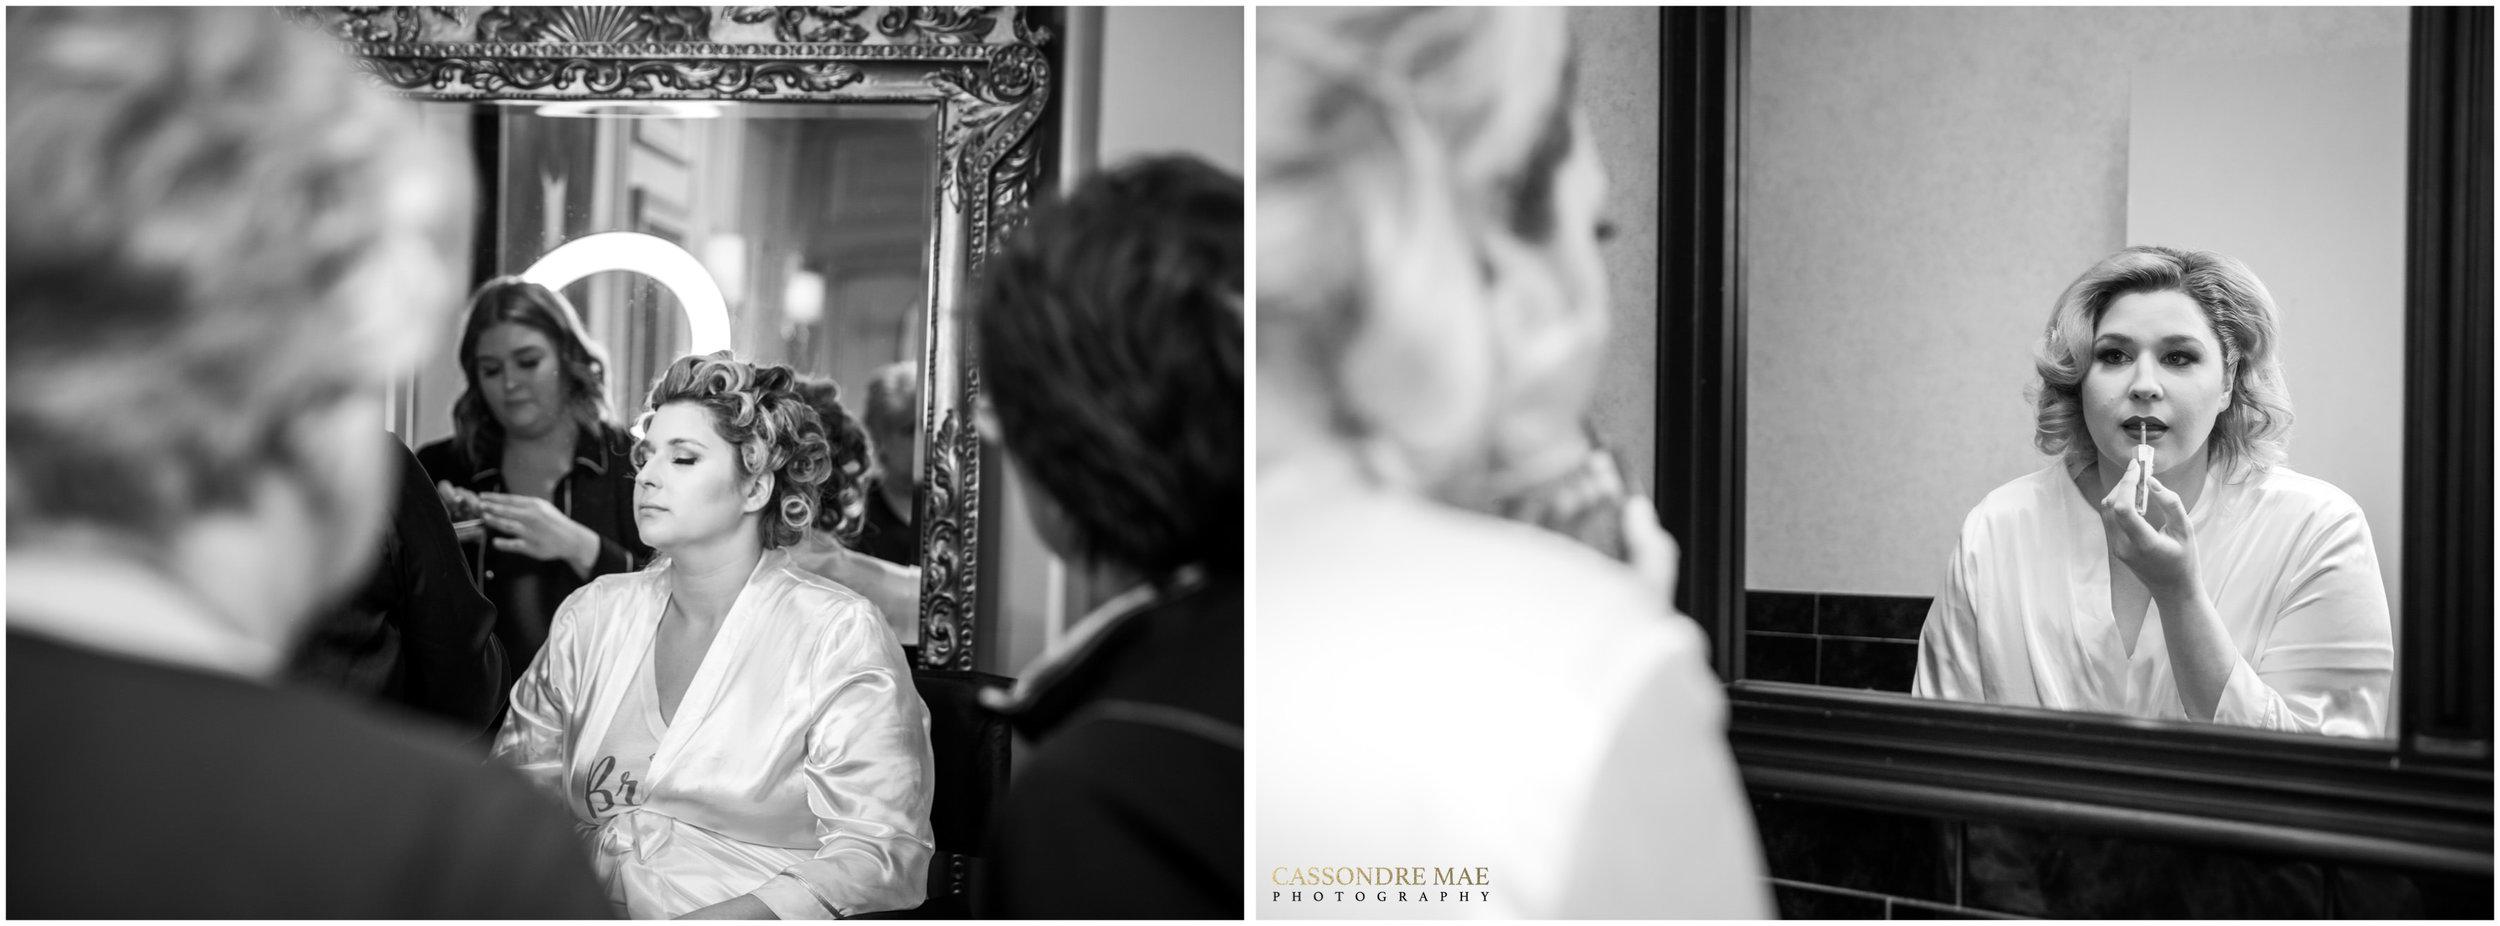 Cassondre Mae Photography Poughkeepsie NY Wedding 3.jpg